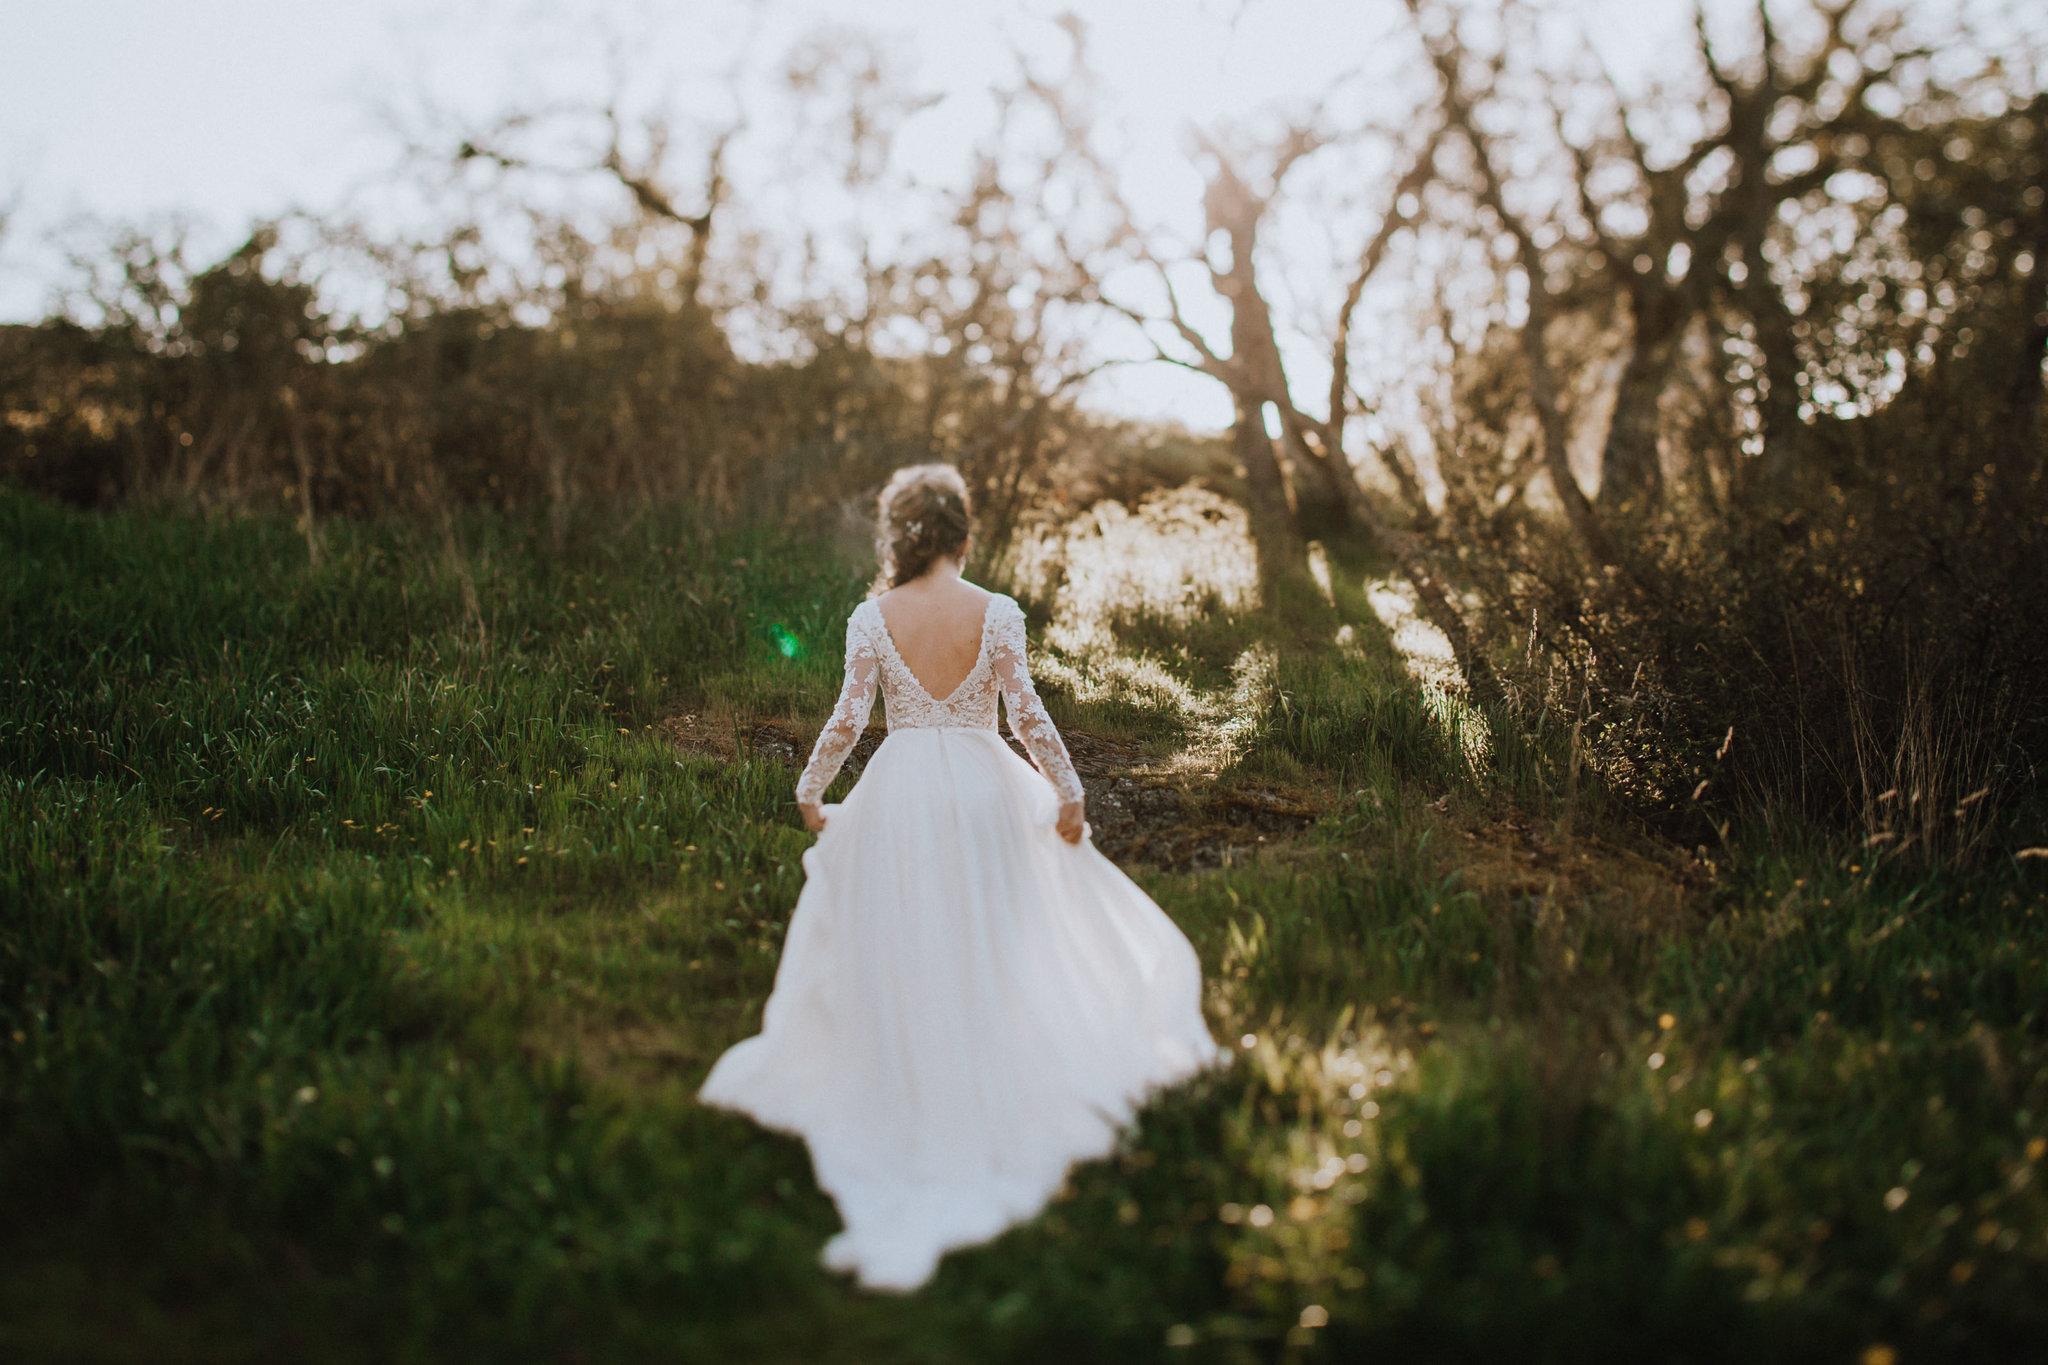 Beach Bridal Session Couple Sunset in the Trees West Coast Weddings Magazine